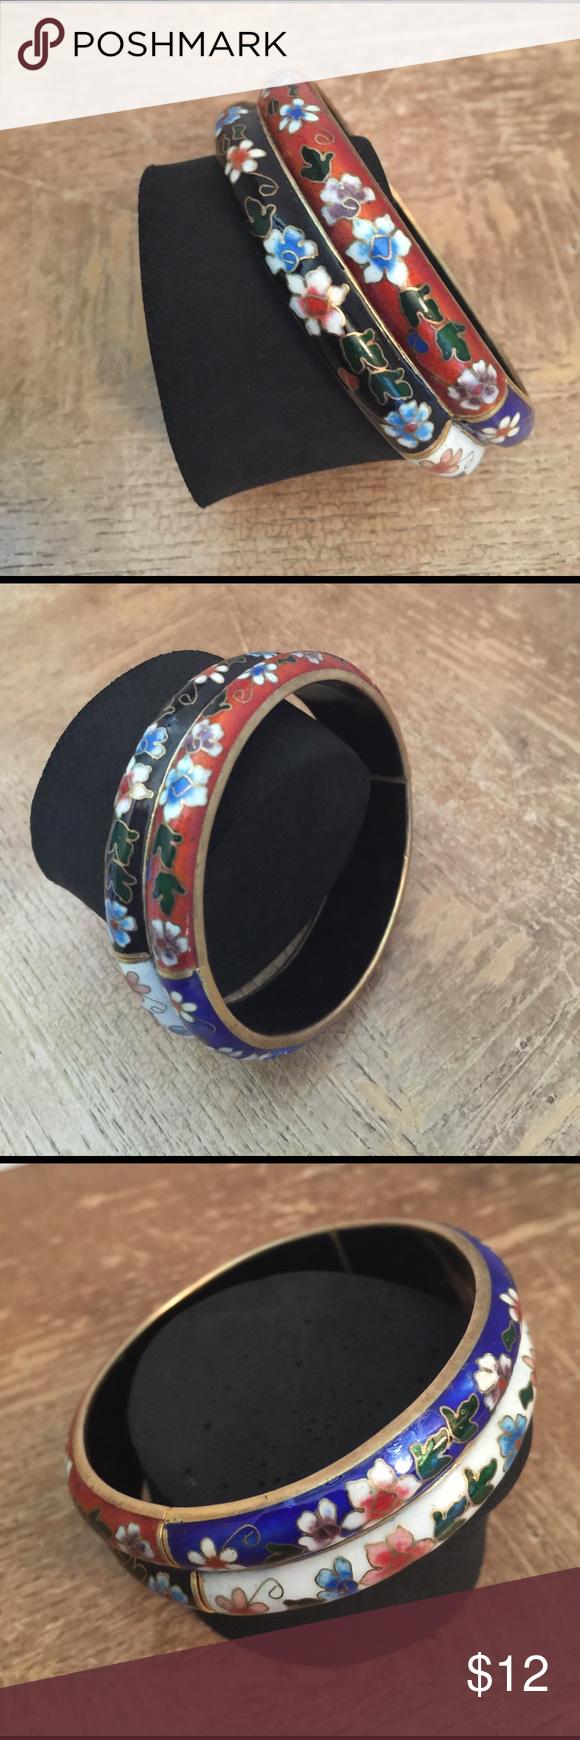 Bracelet ceramic 🌸 🌸Bracelet ceramic Jewelry Bracelets